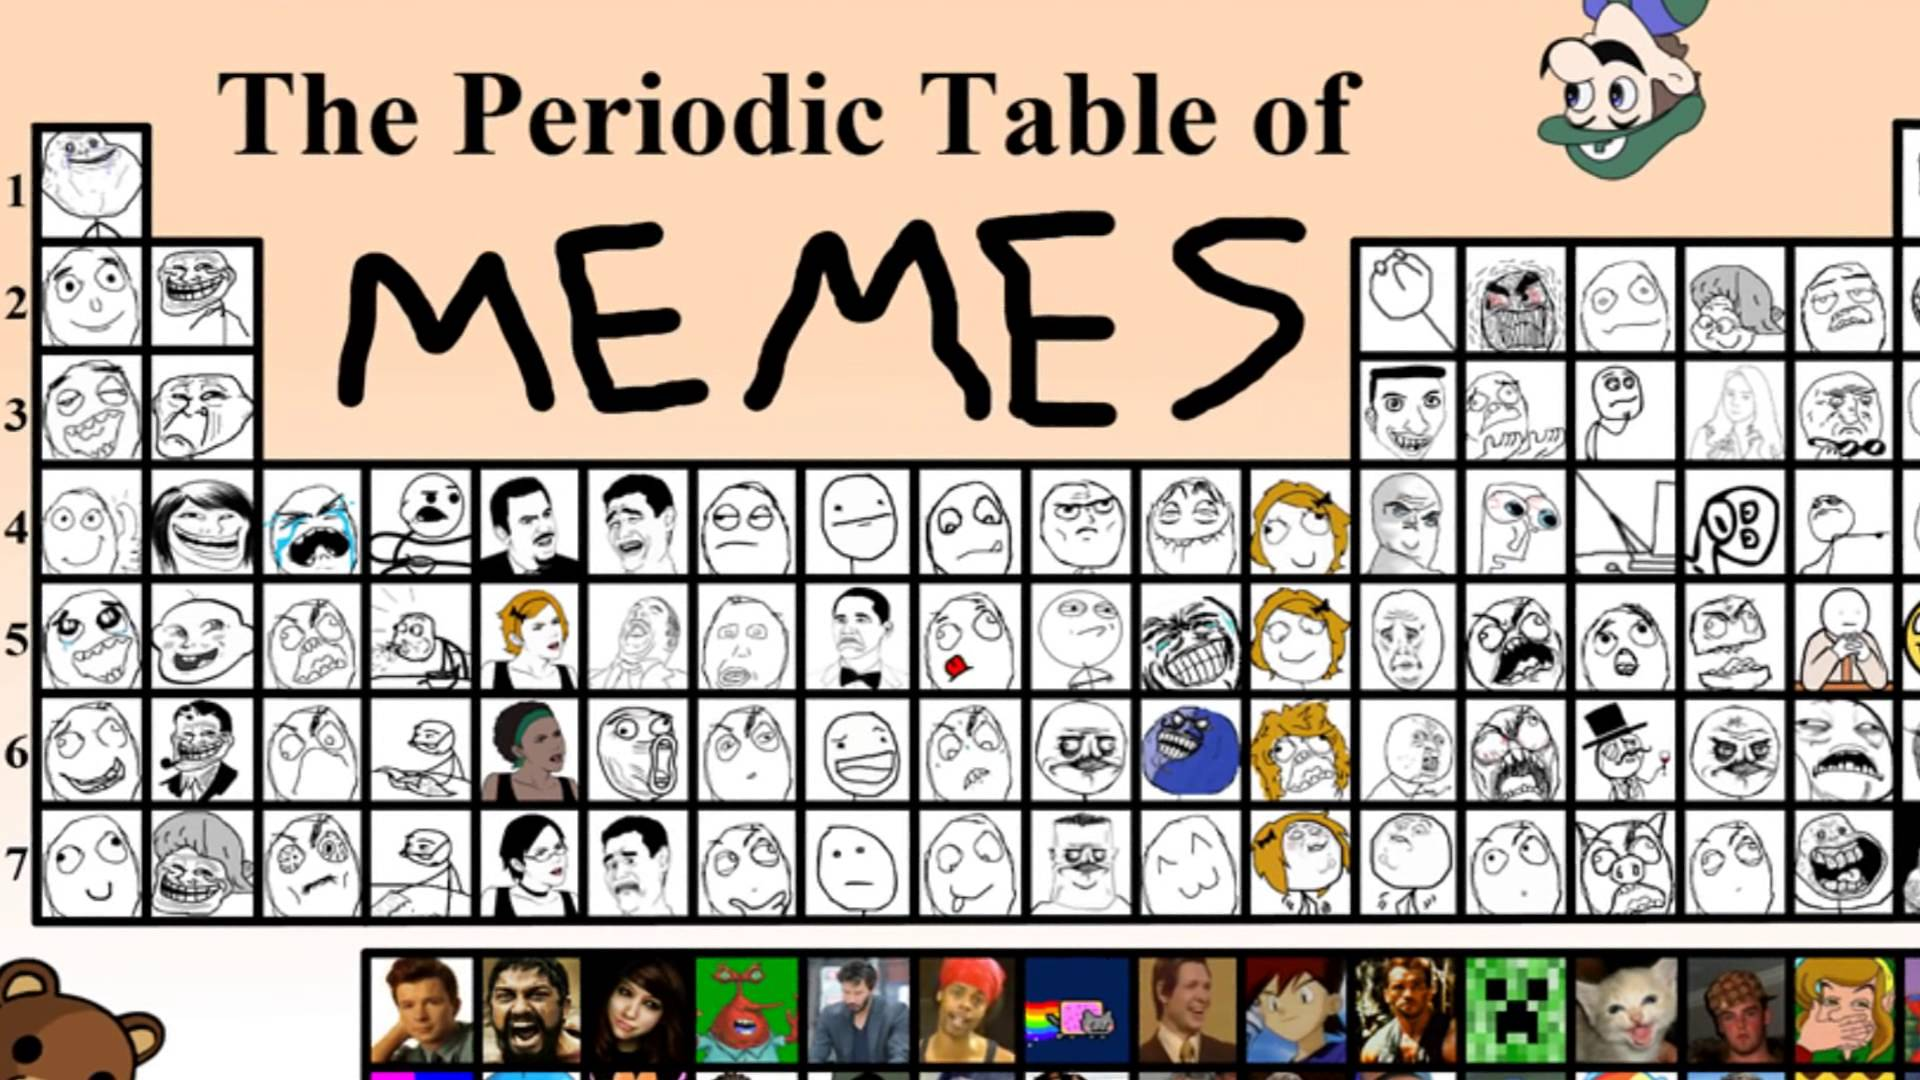 MLG memes 1920x1080